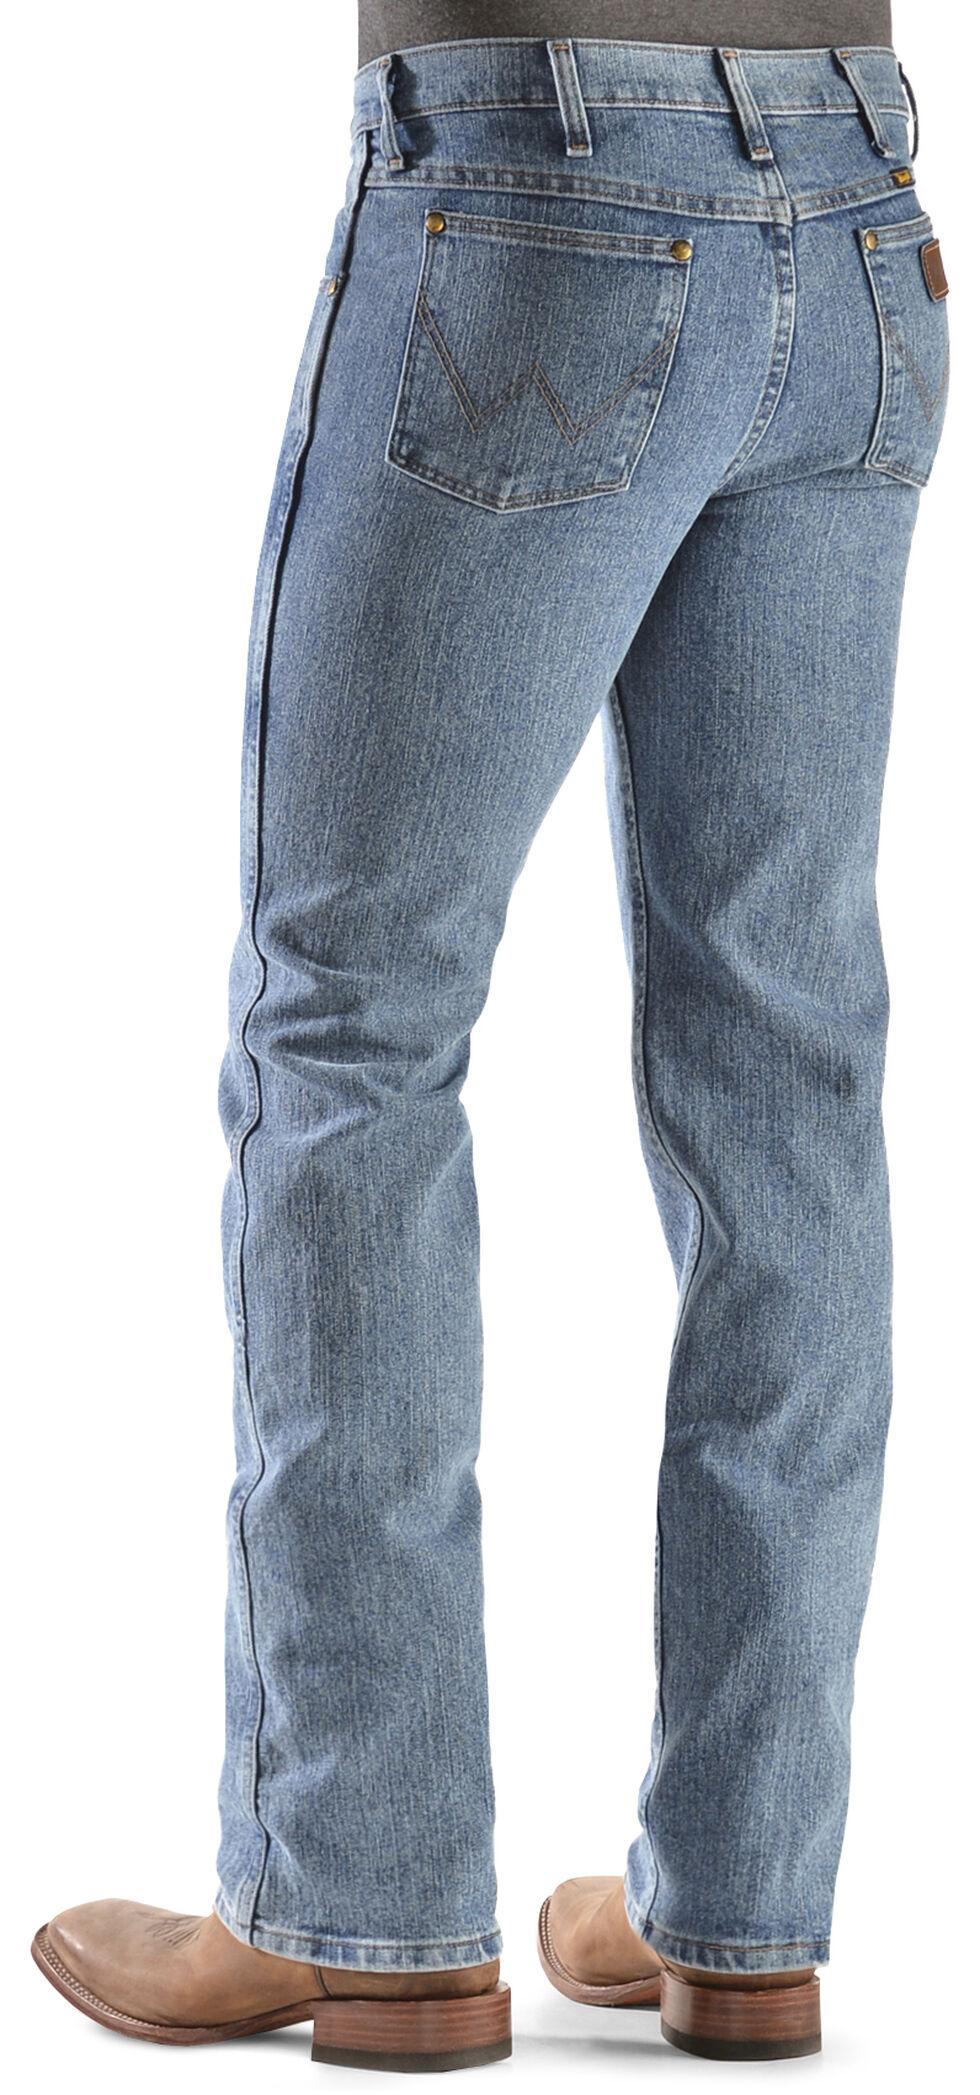 Wrangler Advanced Comfort Slim Fit Jeans - Reg, Stone Lt, hi-res